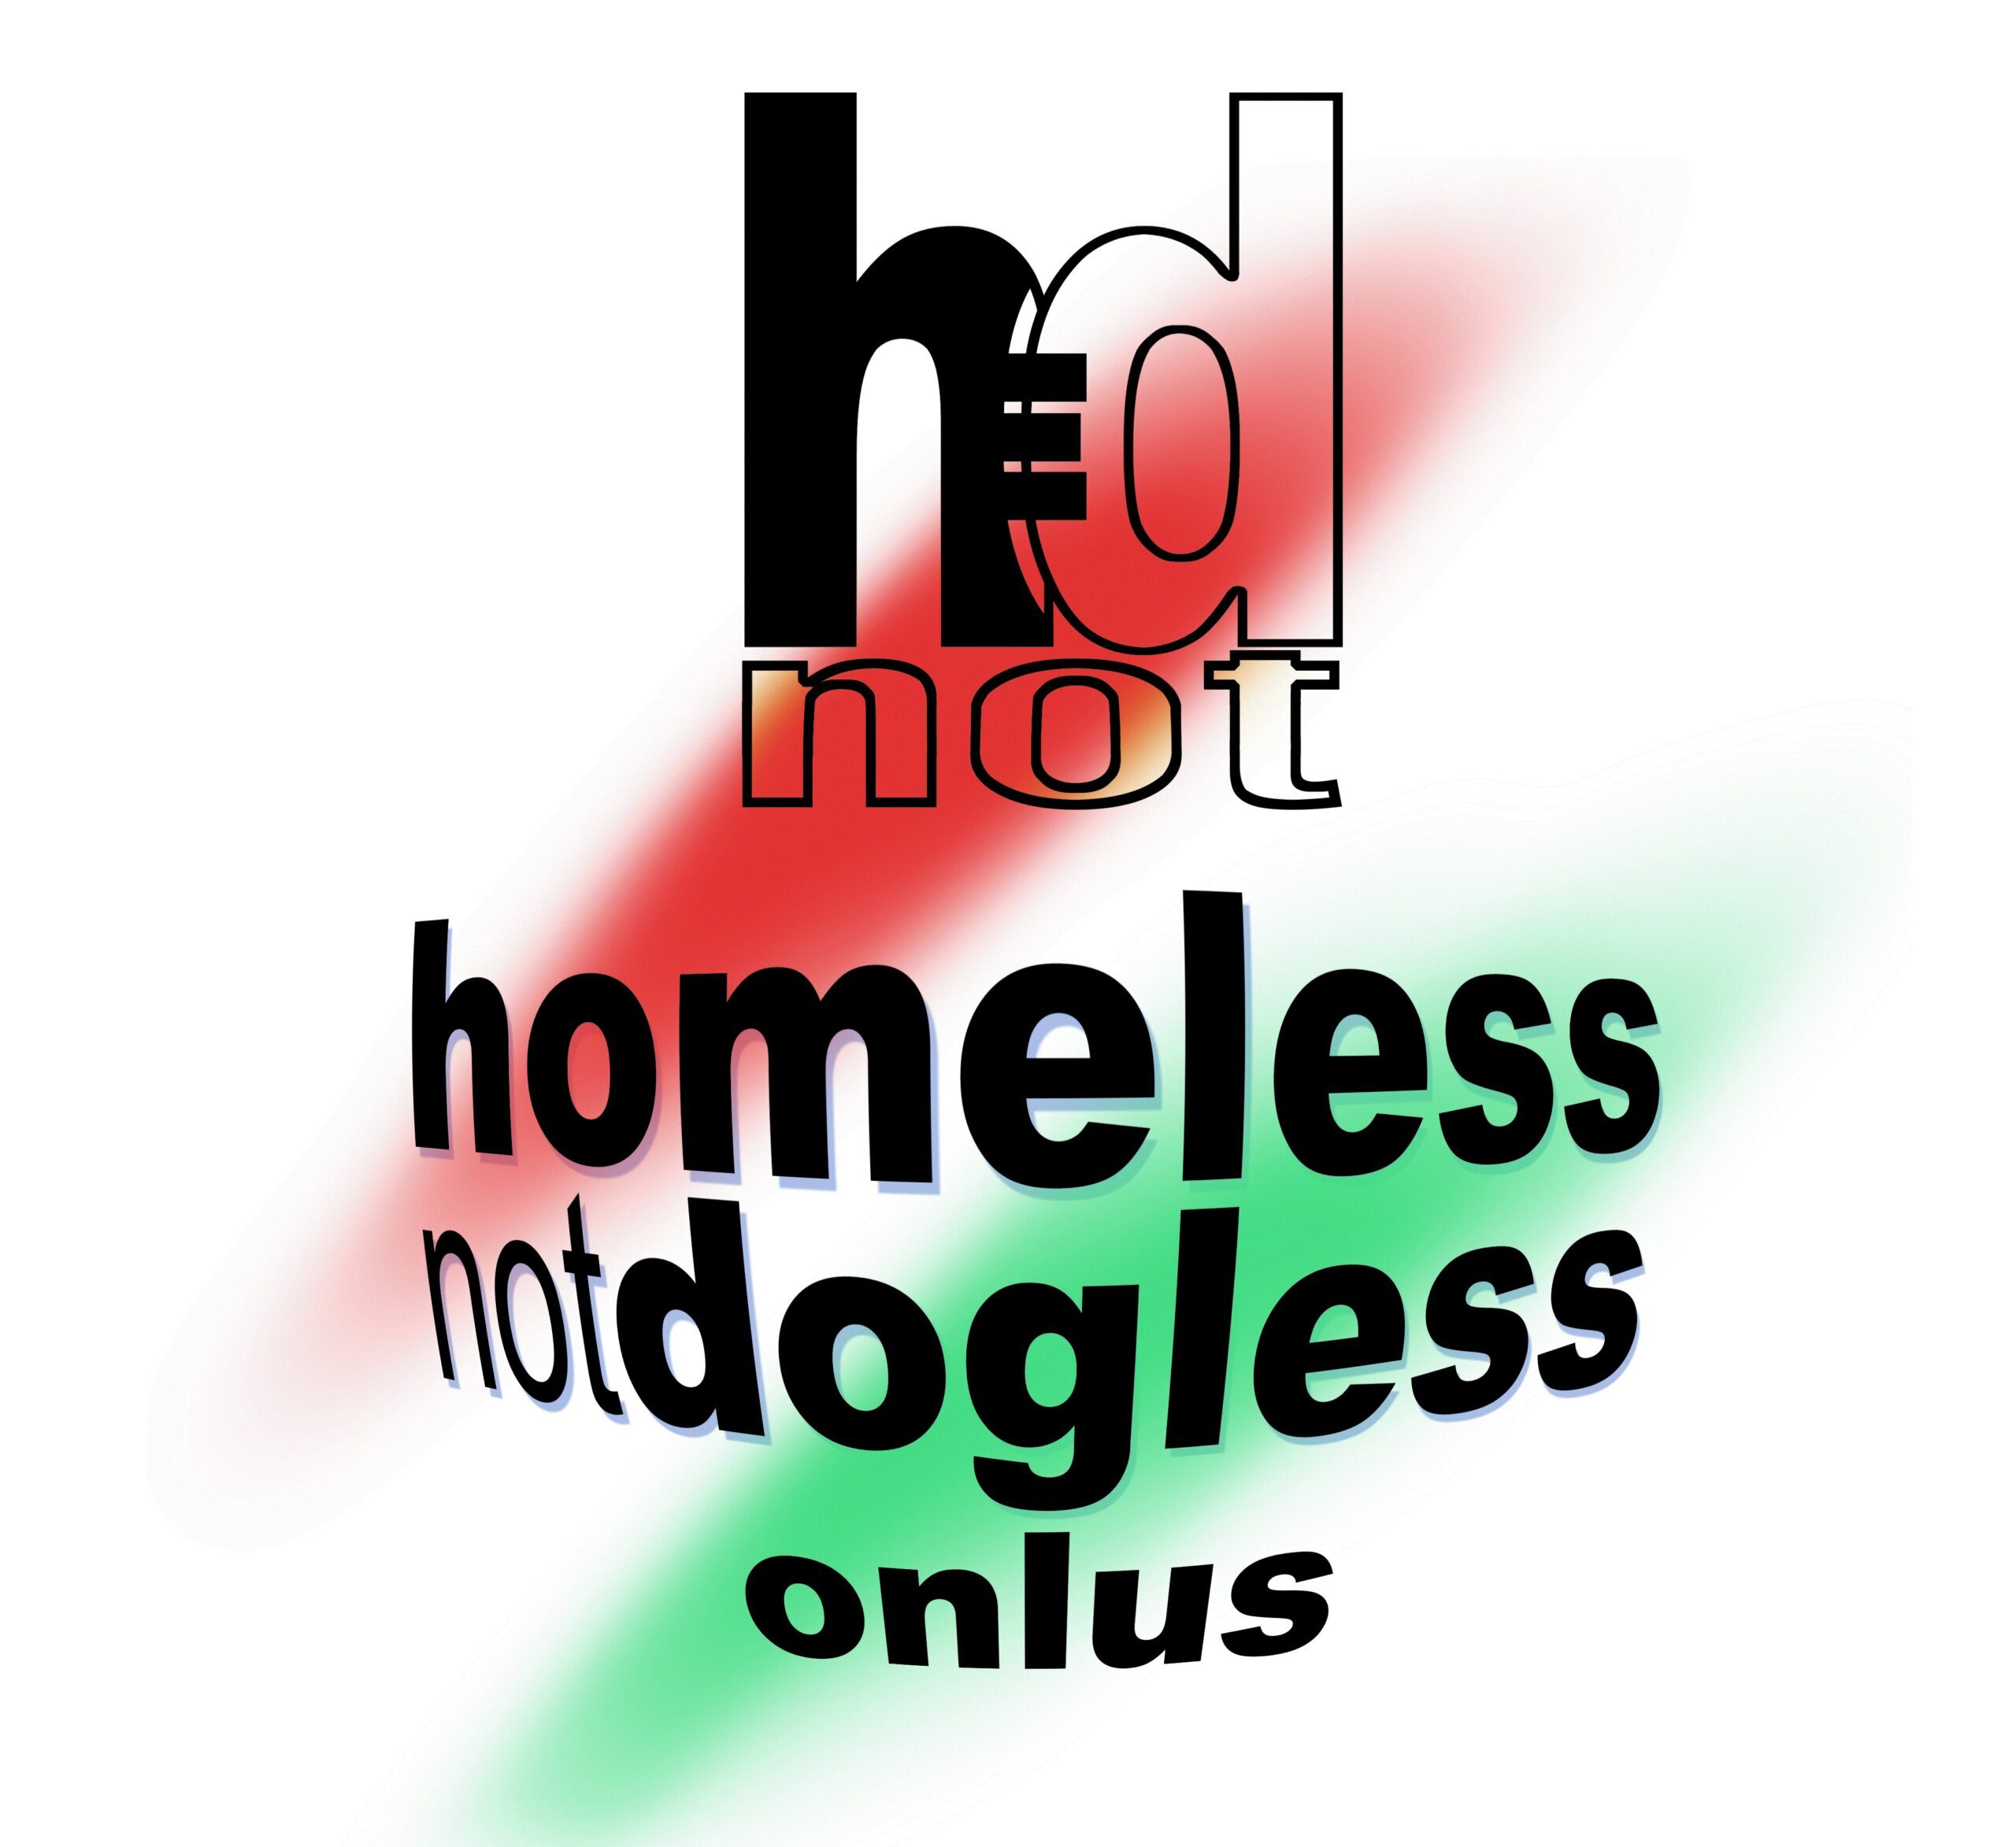 Homelessnotdogless 2.0 onlus